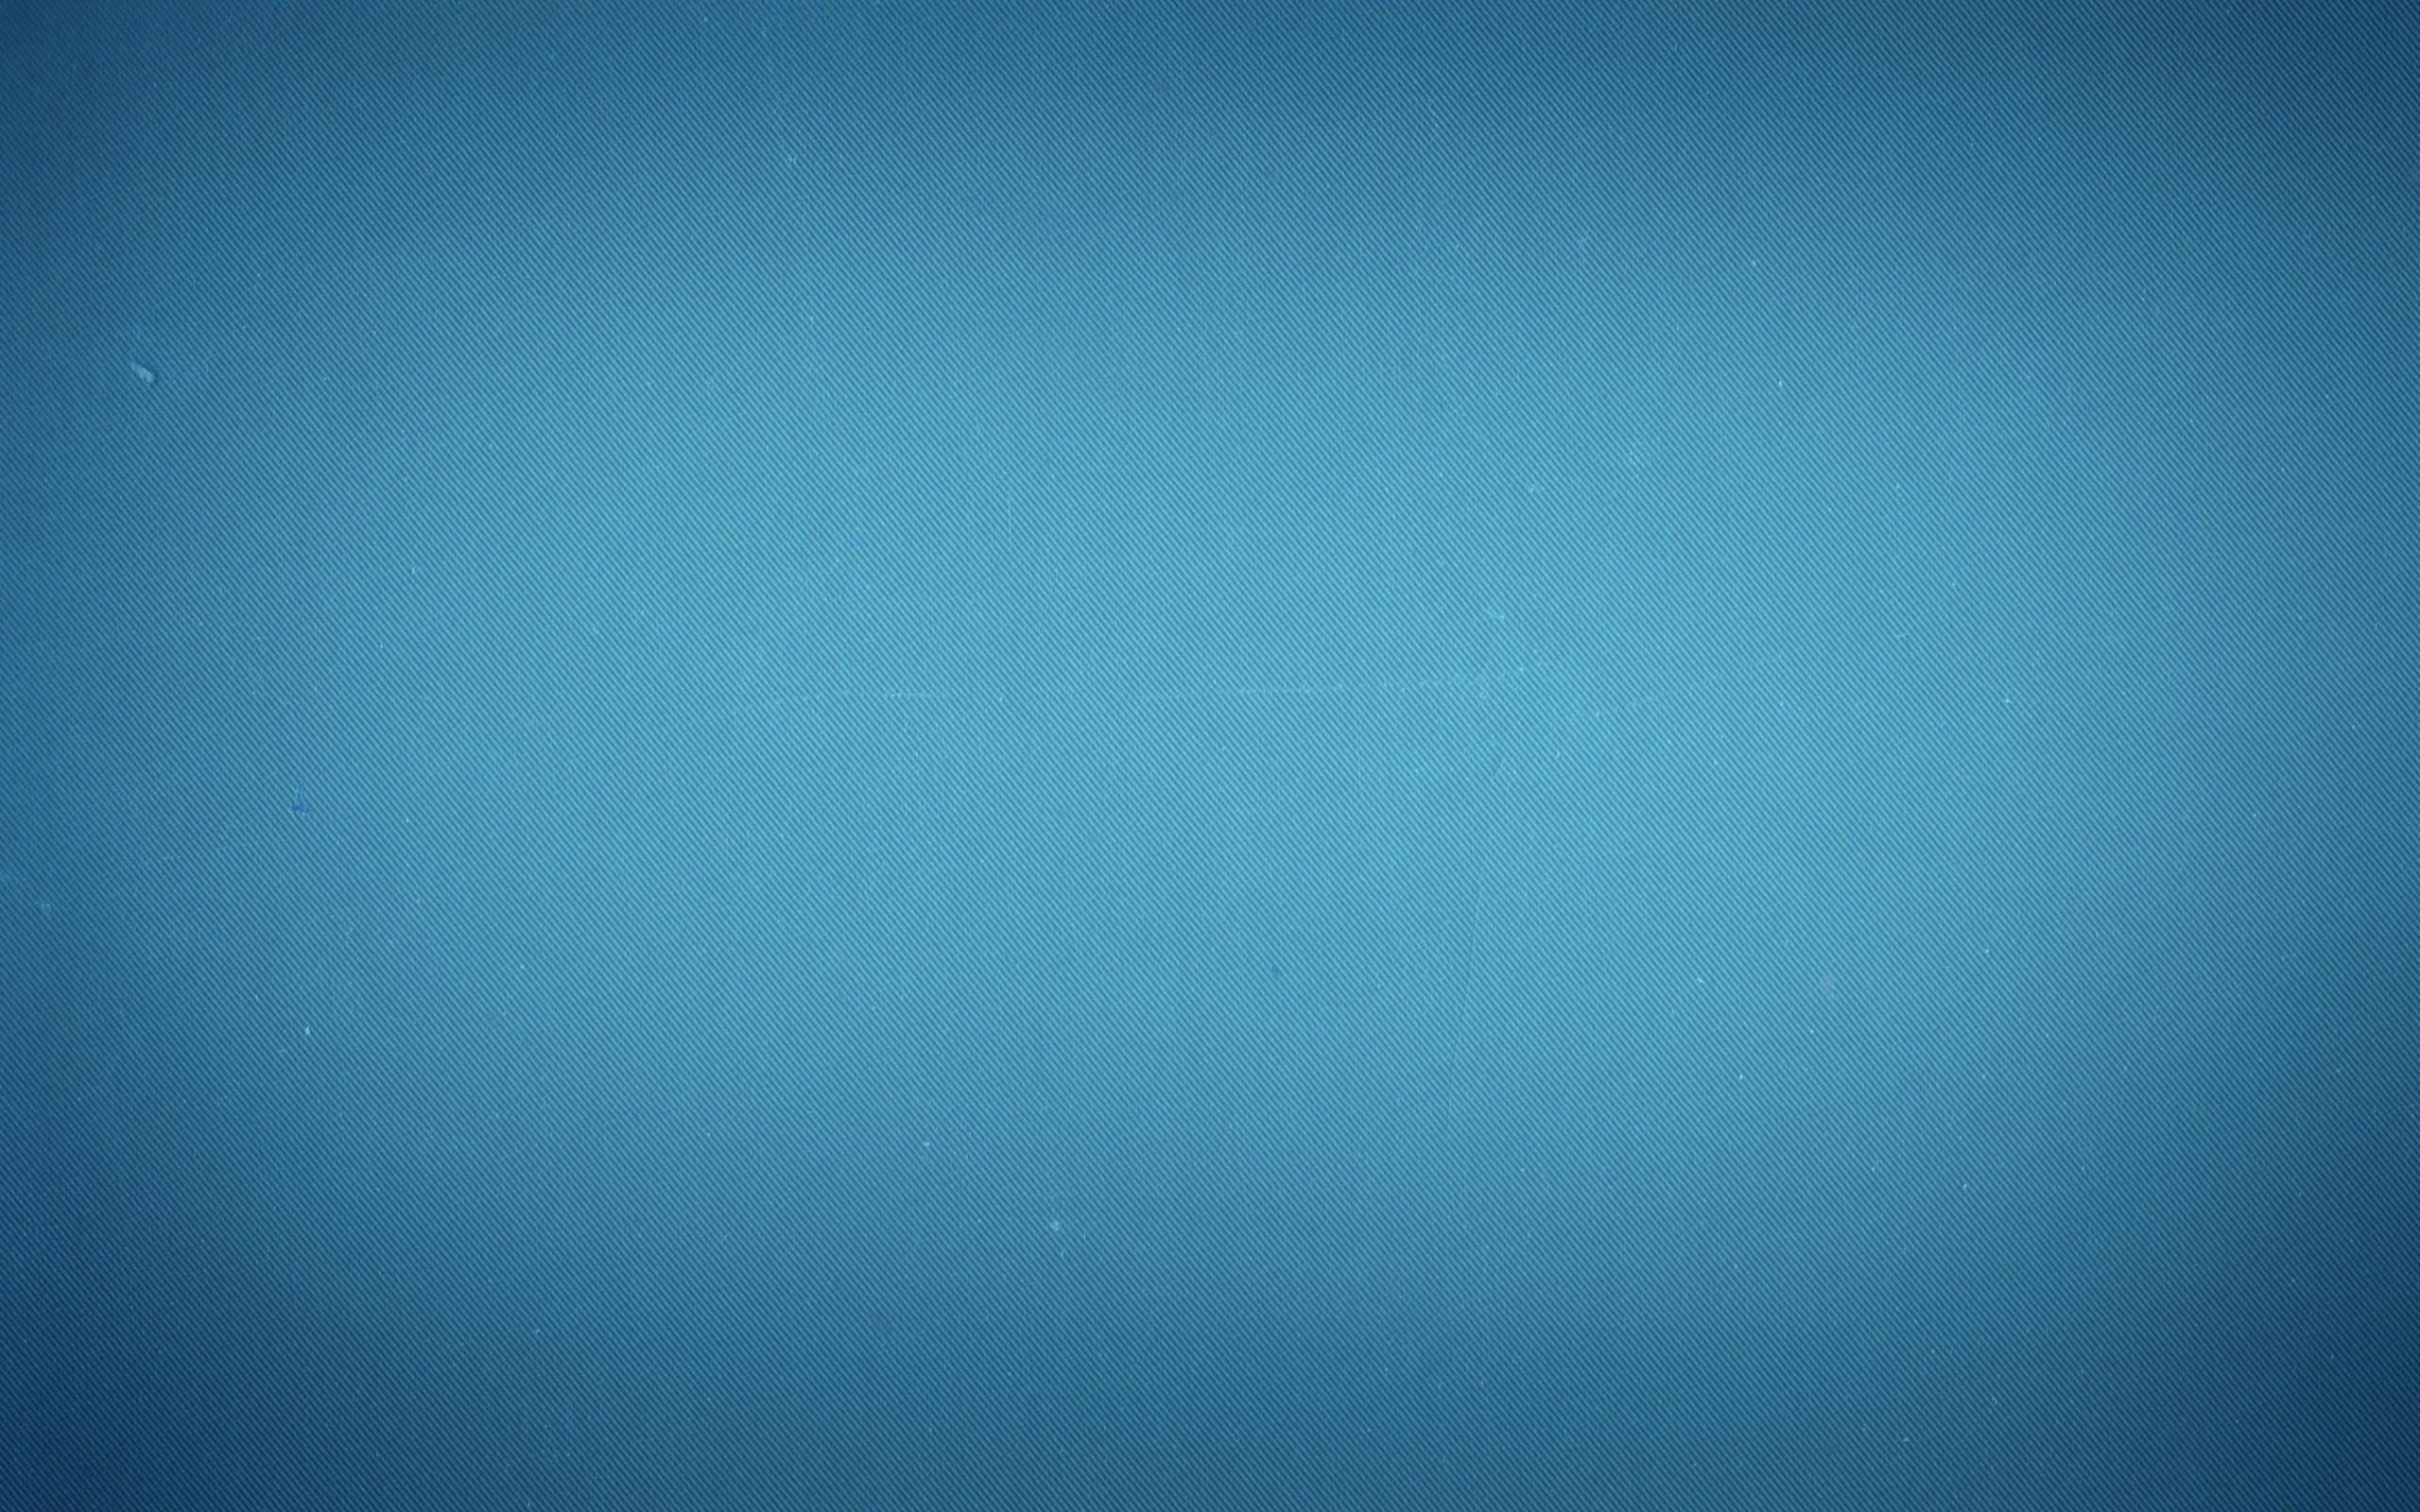 Amazing Wallpaper High Resolution Blue - 121437-gorgerous-blue-texture-background-2560x1600  Image_392247.jpg